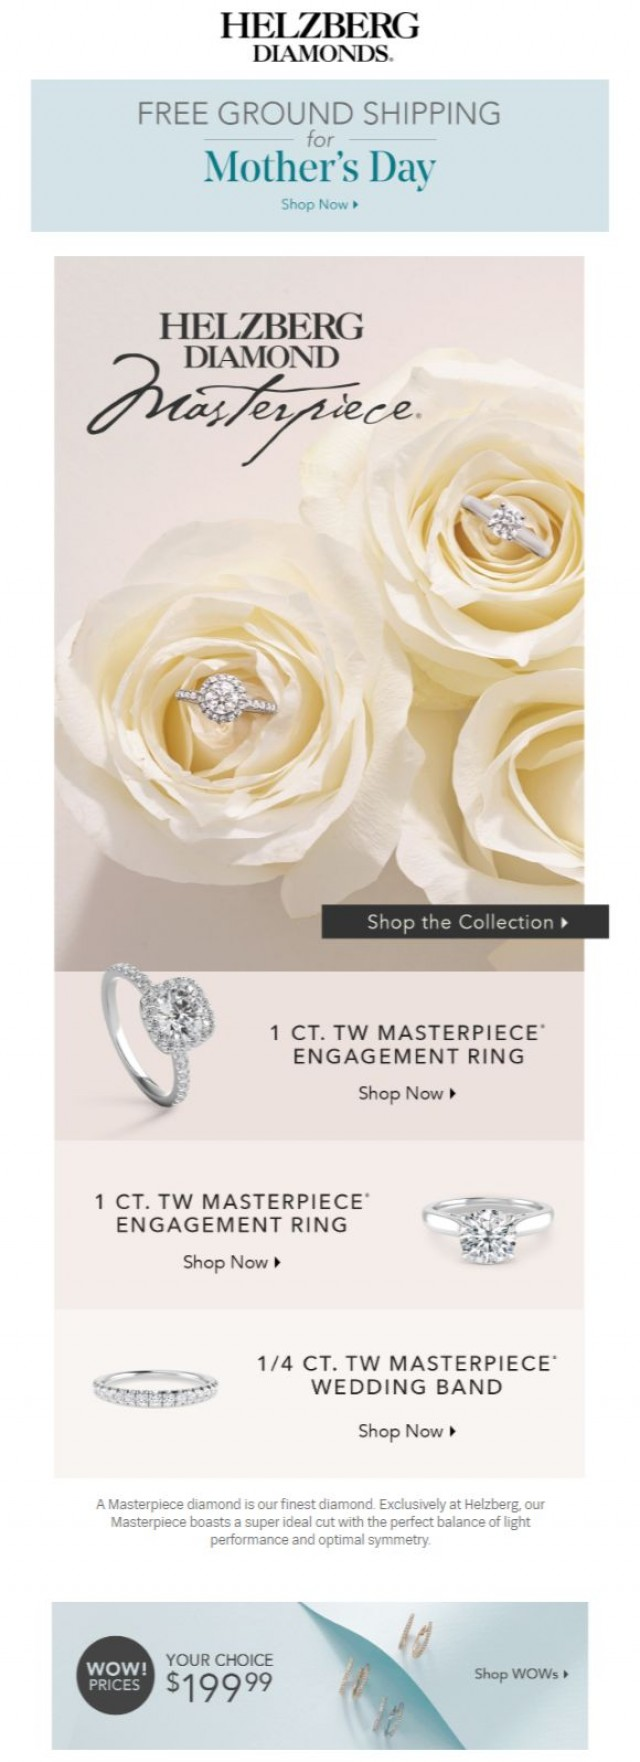 Apr 25, 2019 - Helzberg Diamonds - Our Finest Diamond